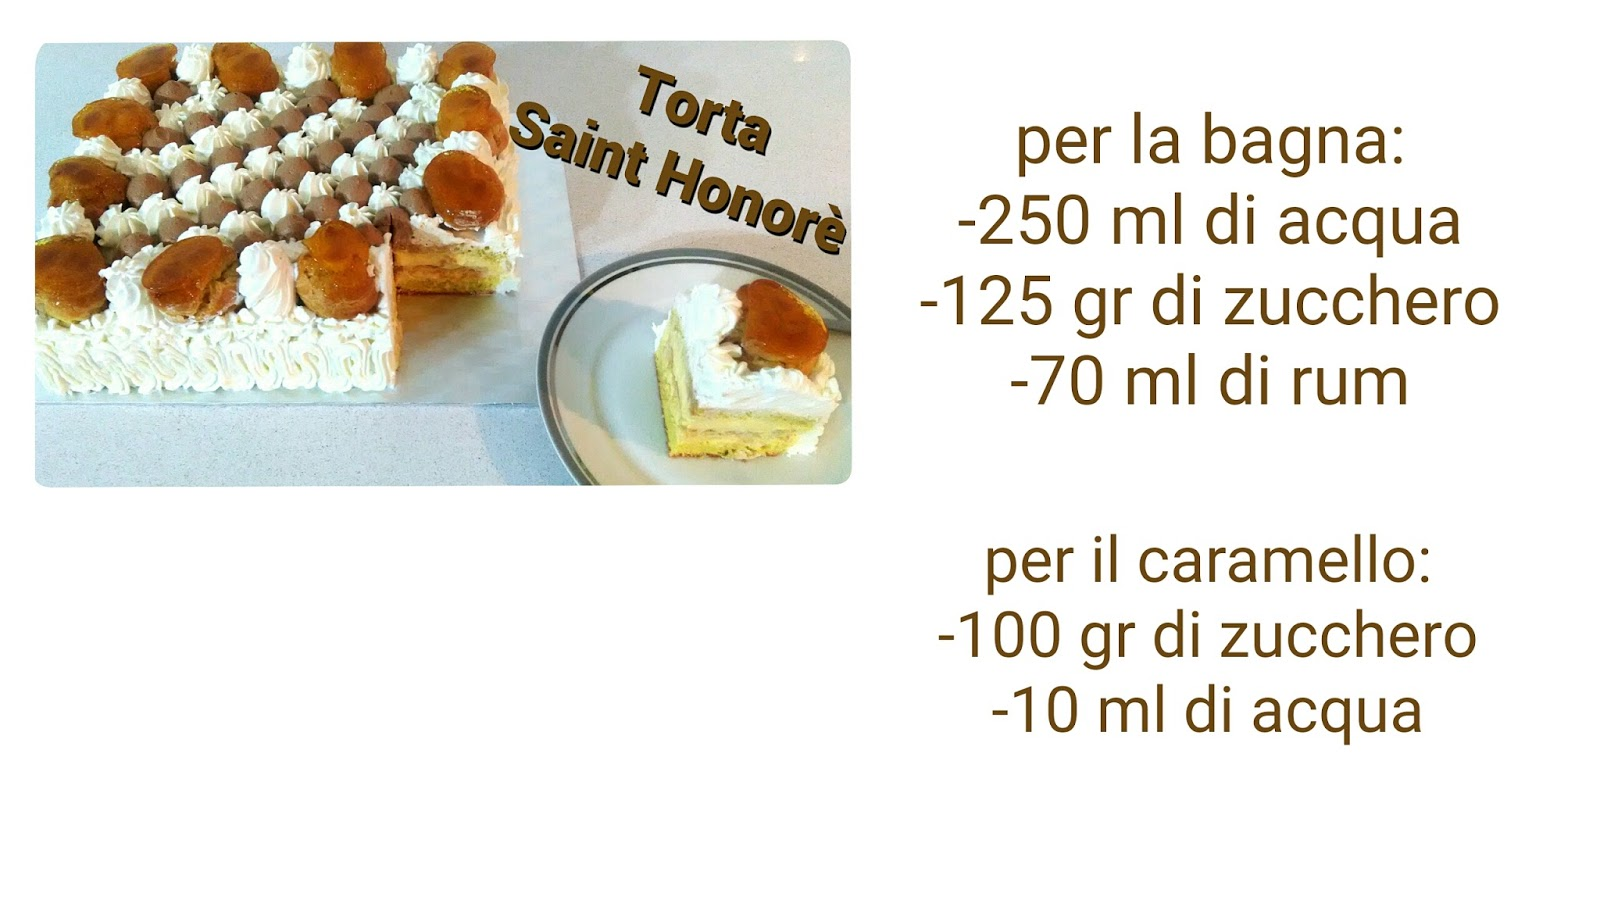 Le ricette di TerroreSplendore: Torta Saint Honorè